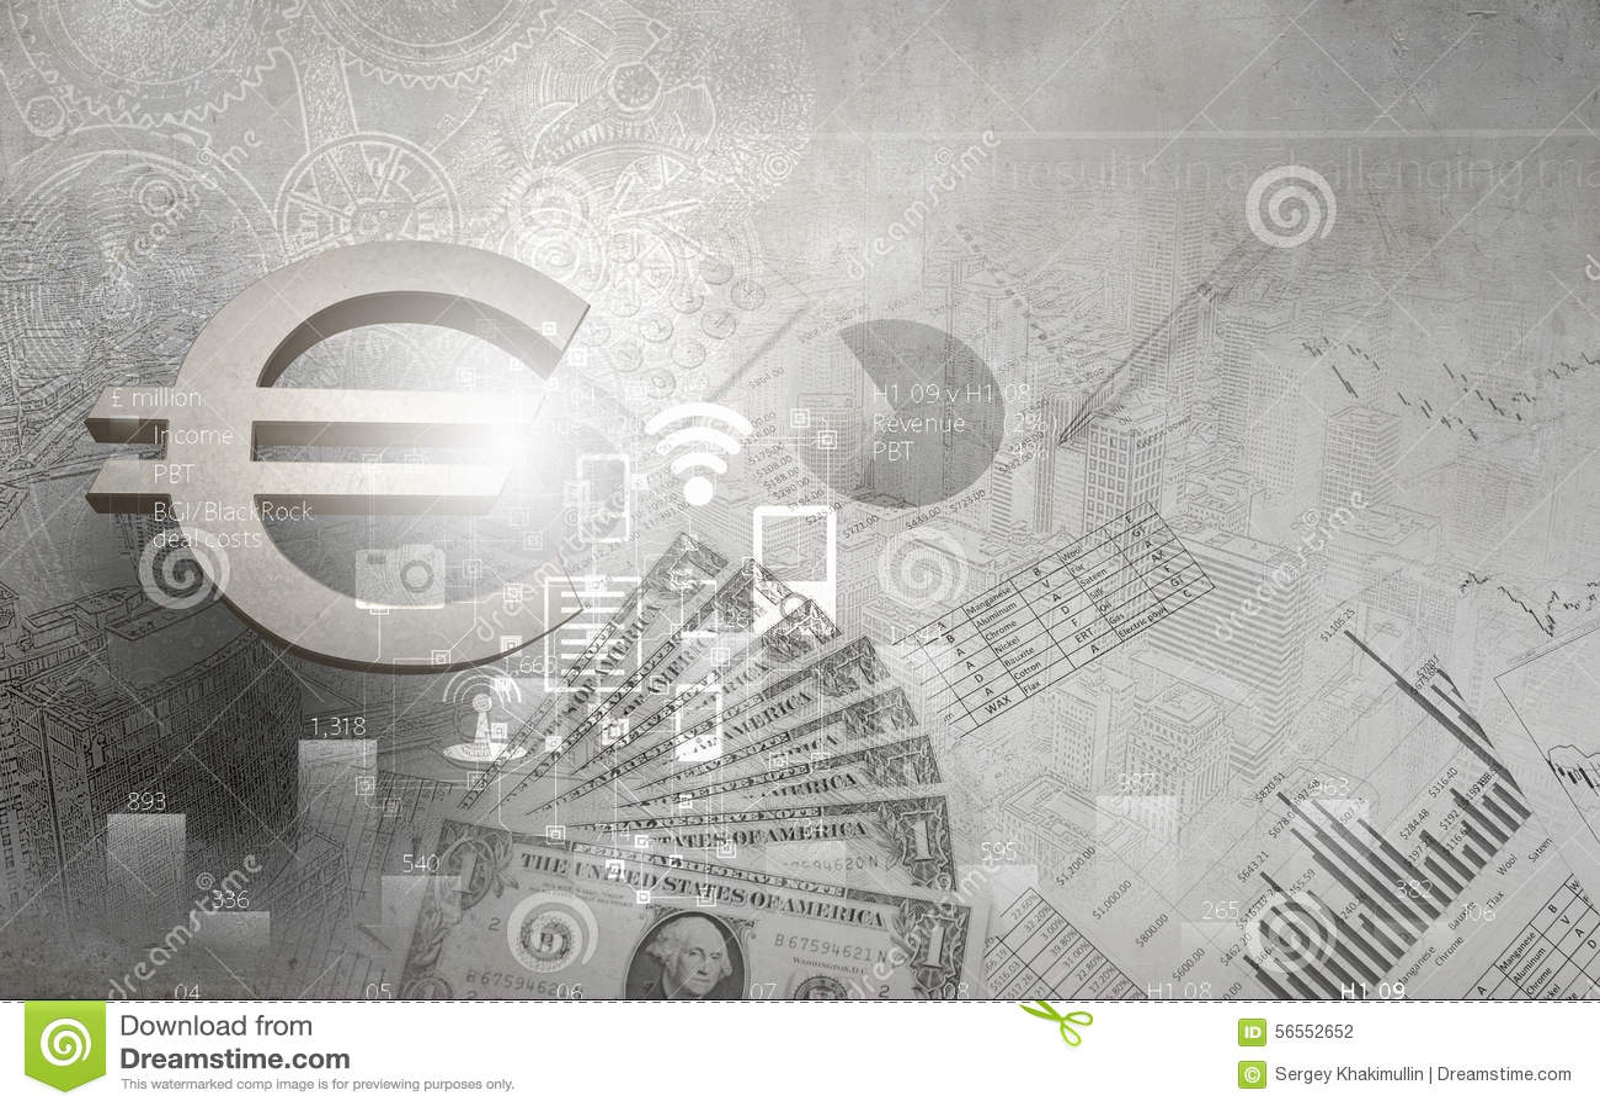 Download Επιχειρησιακό θέμα στοκ εικόνες. εικόνα από χρηματοδότηση - 56552652